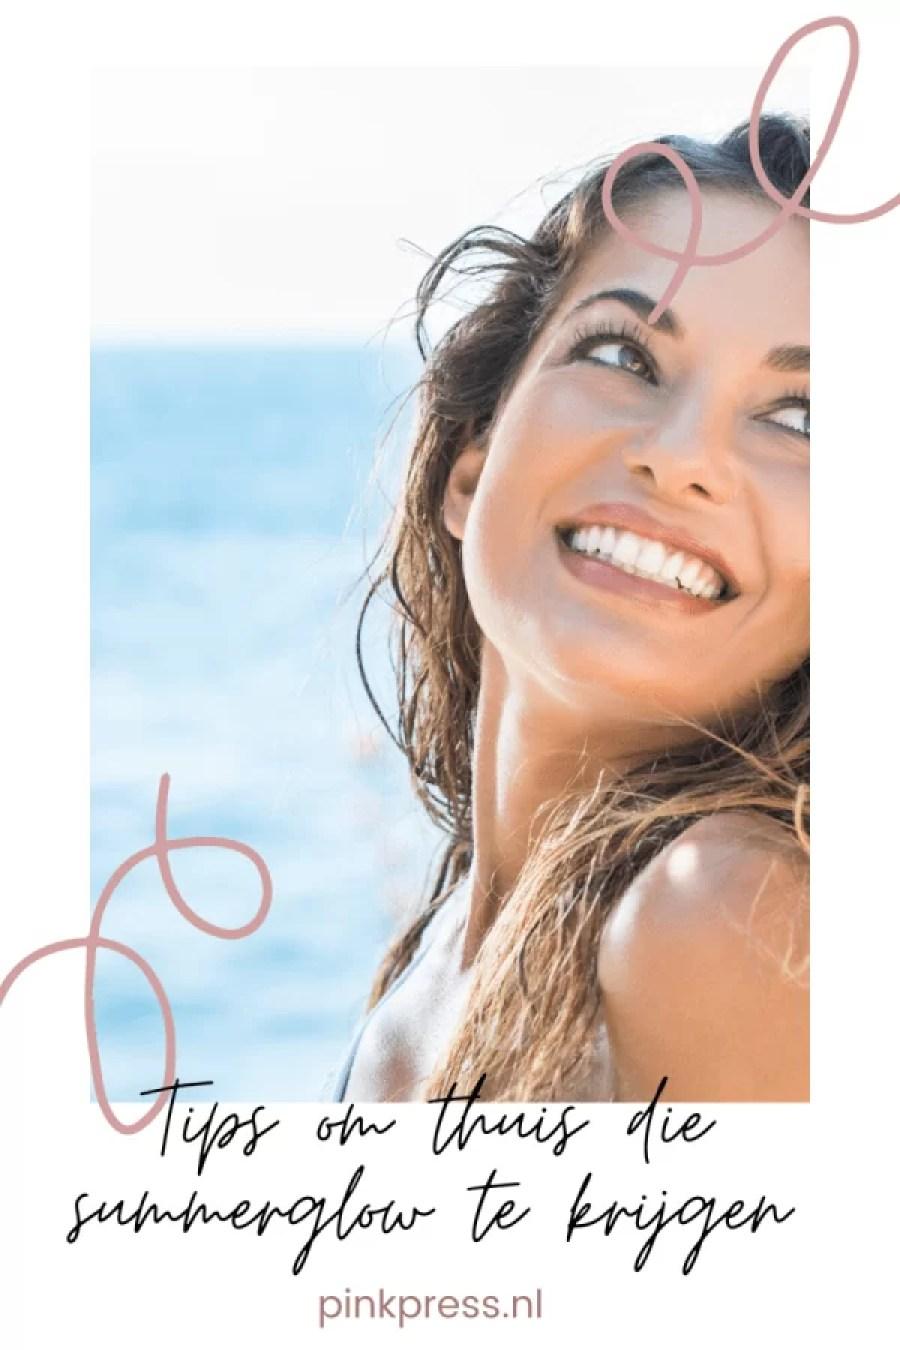 9DA29474 0190 4DB2 942F 6A5C6A935B85 - Glam & Glowing | 7 glanzende beauty tips om thuis te doen